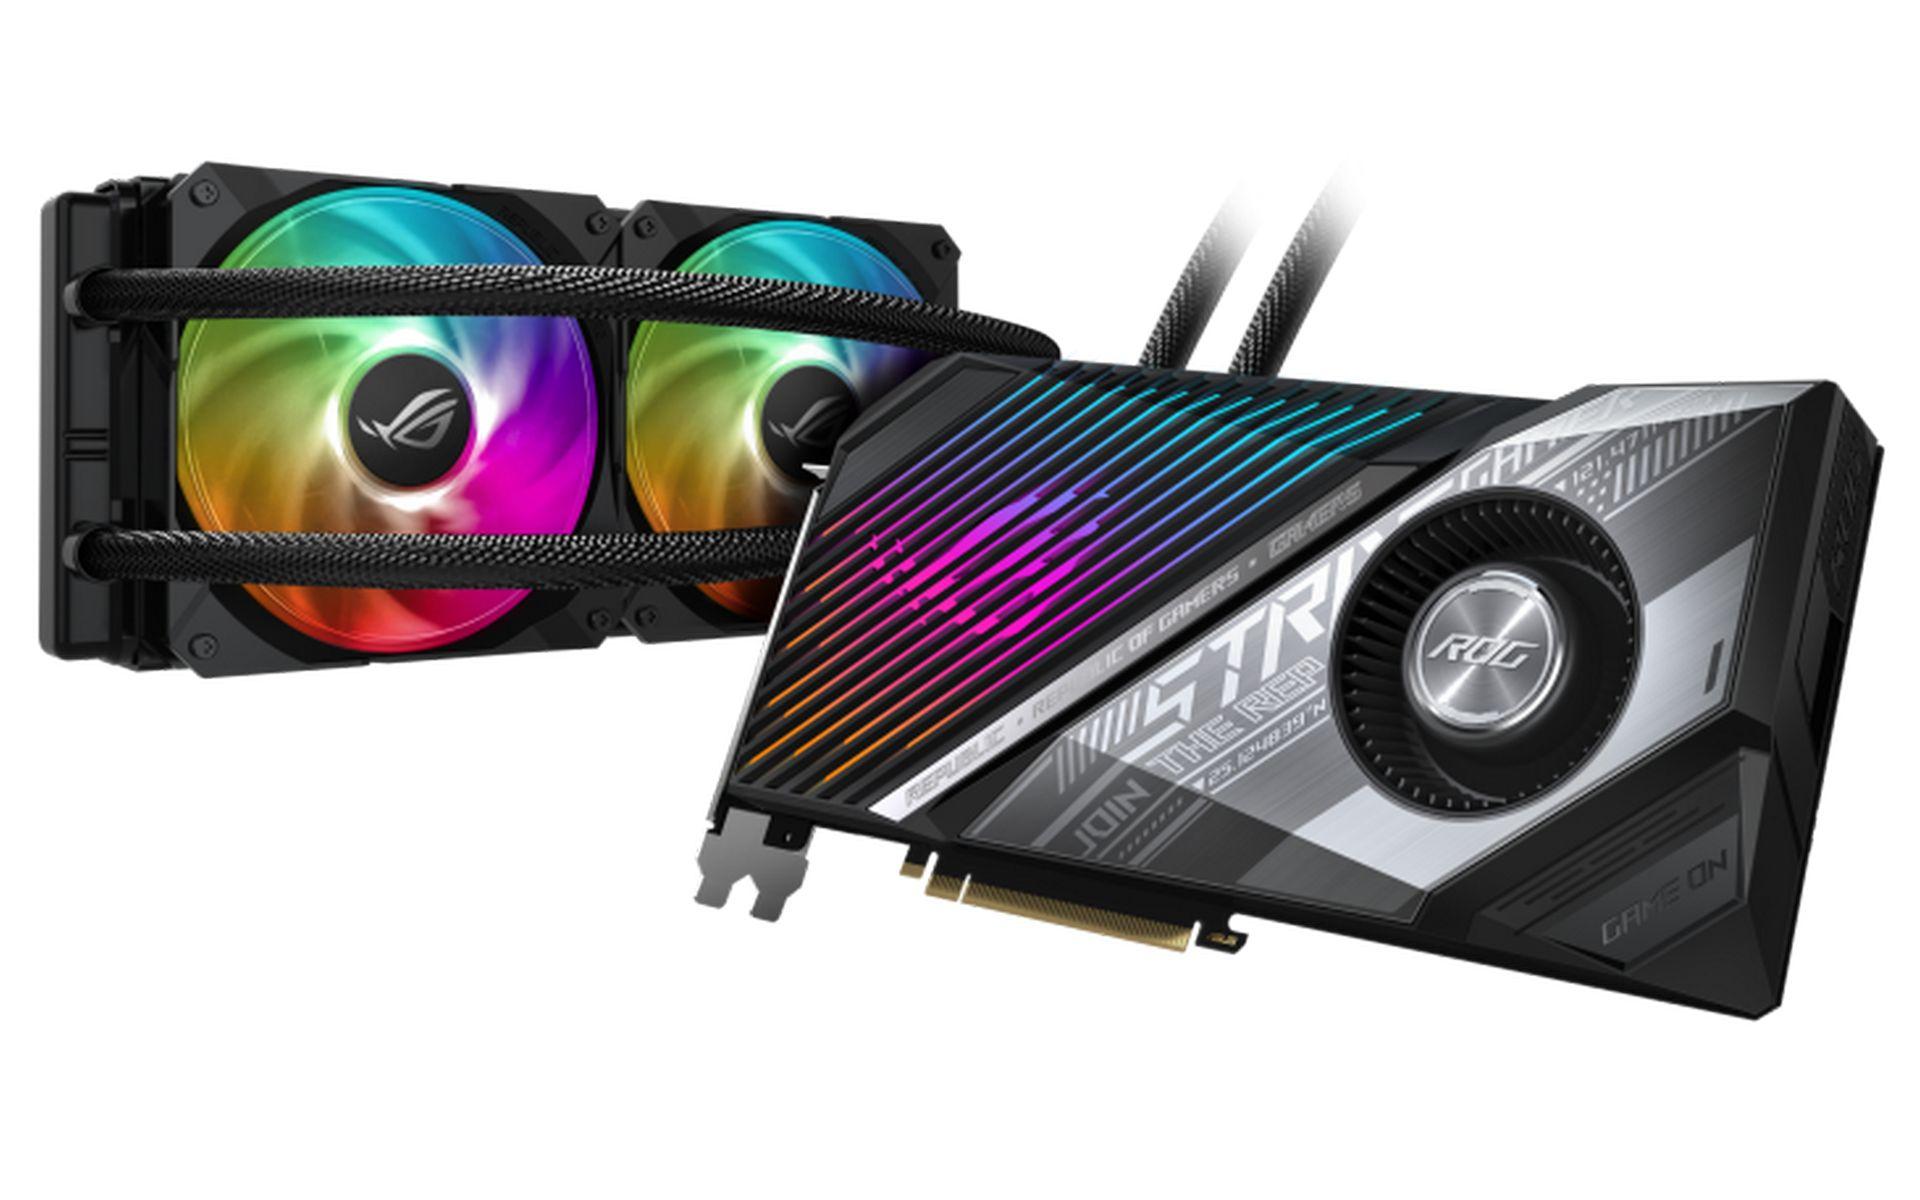 Asus ROG Strix LC AMD Radeon RX 6800 XT OC Edition